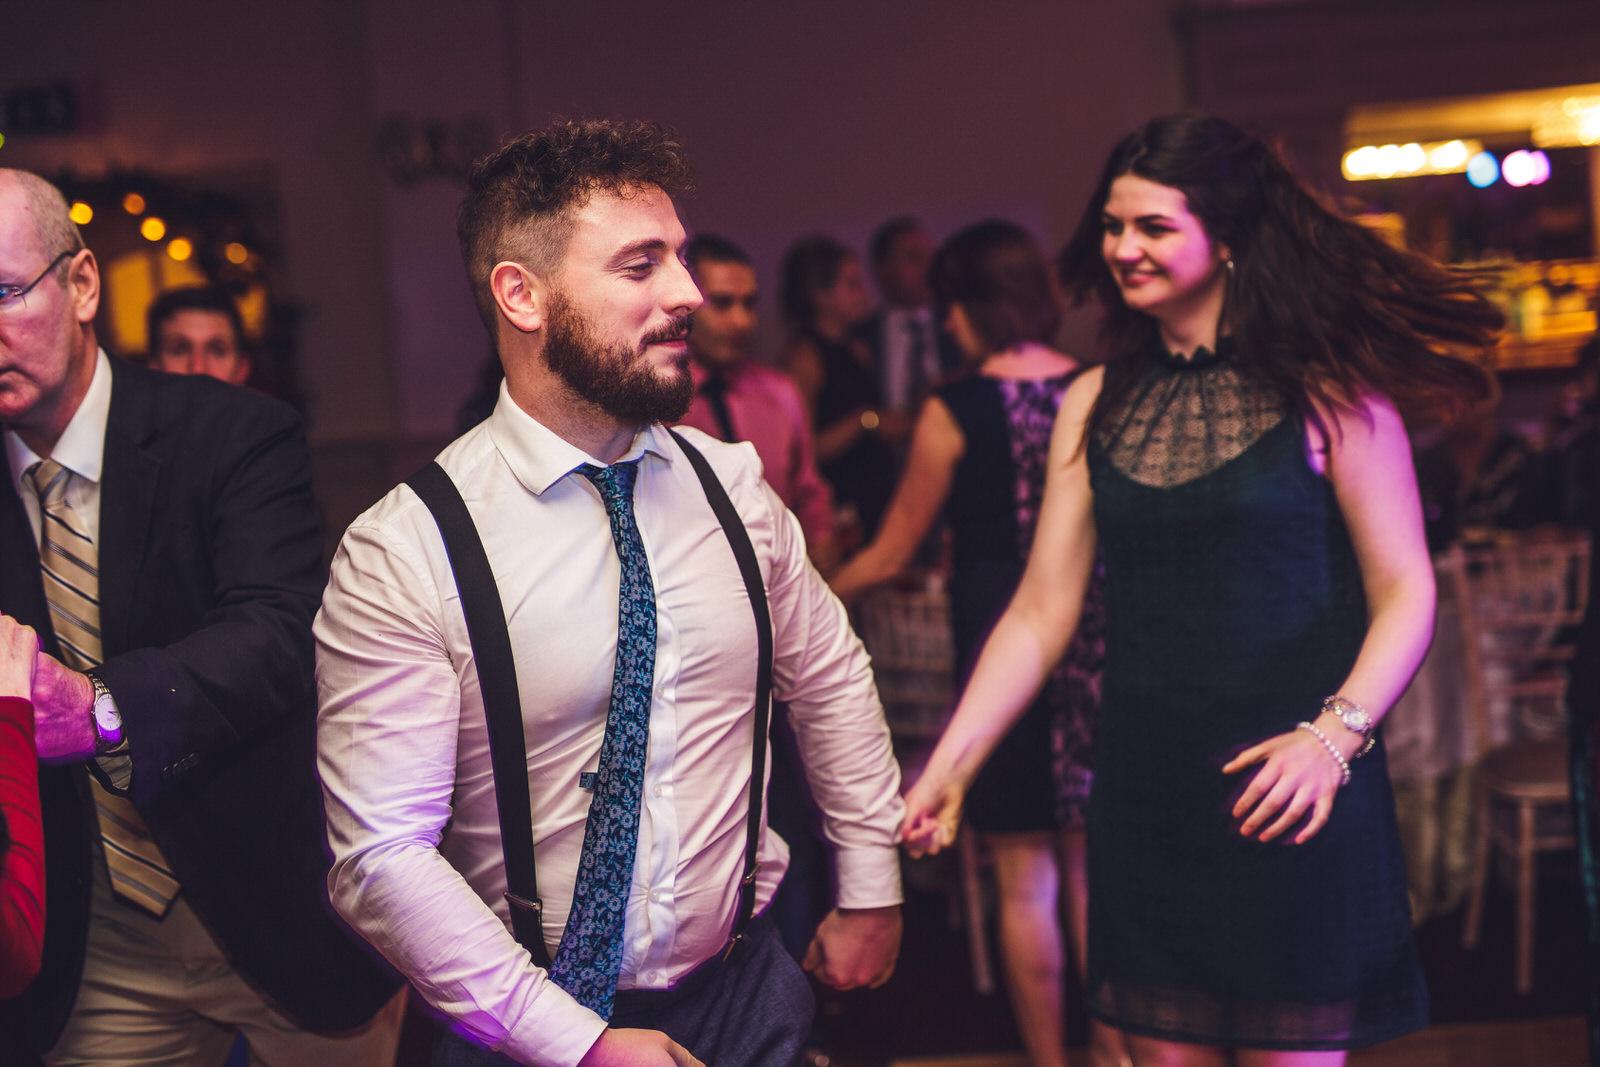 Roger-kenny-wedding-photographer-greystones-wicklow-dublin_136.jpg